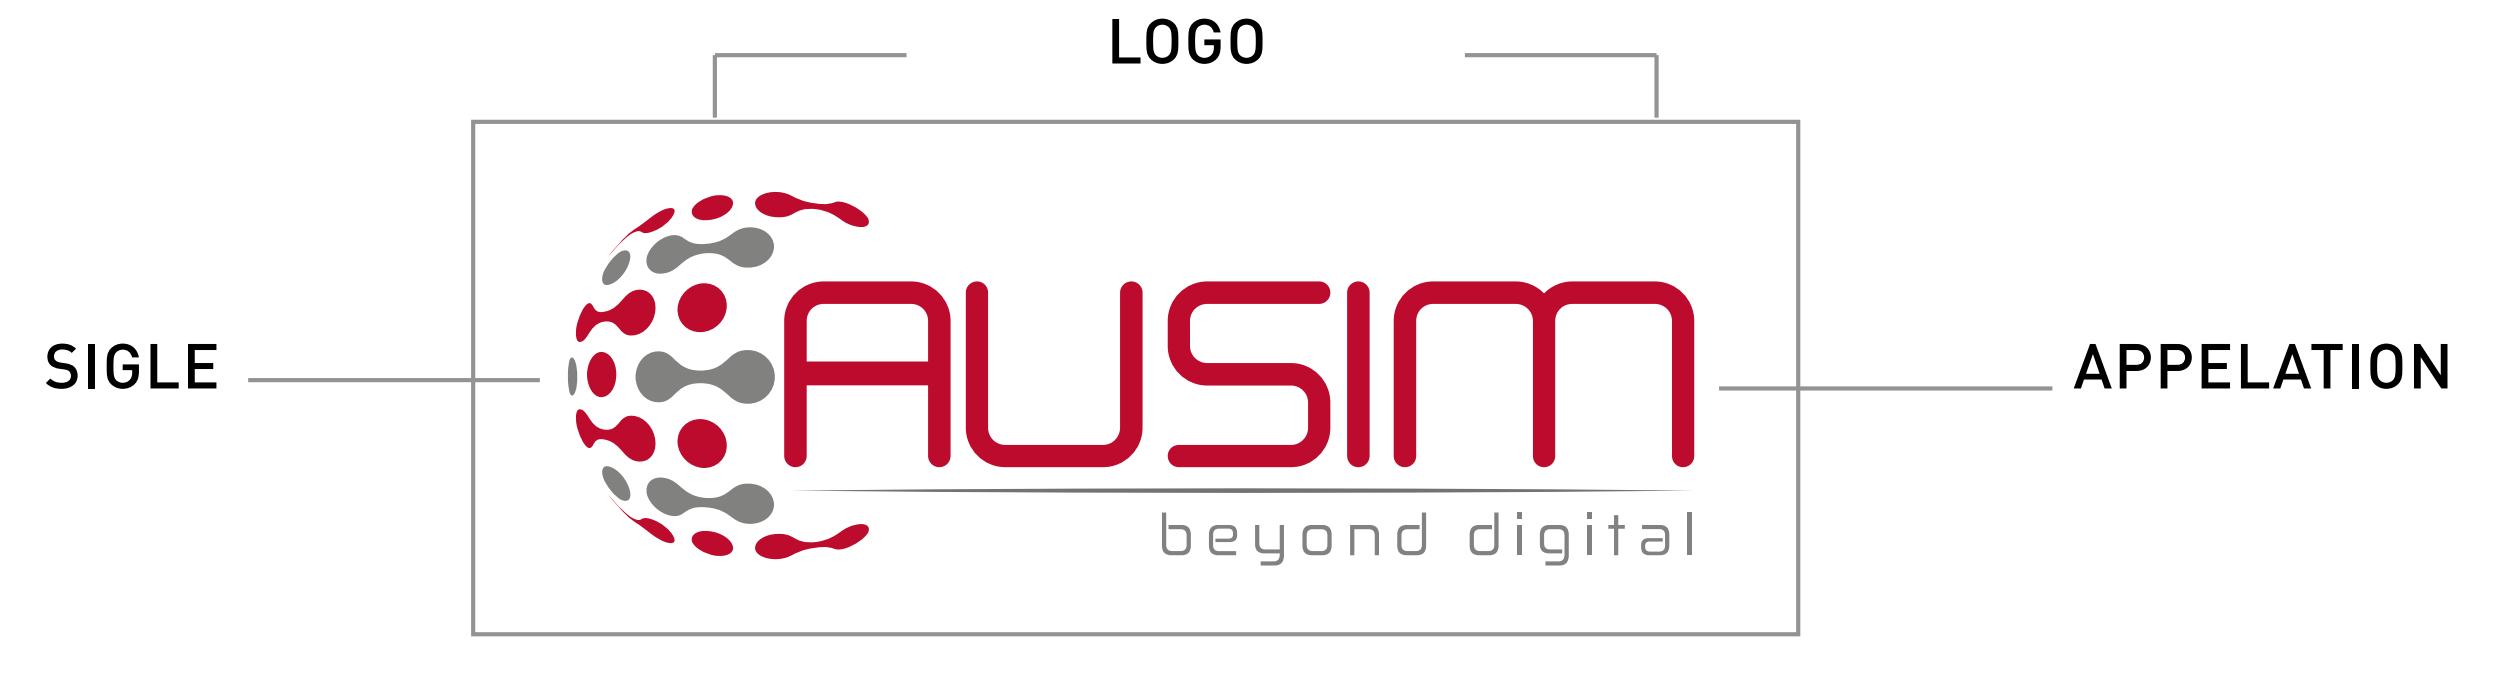 Sigle and Logo